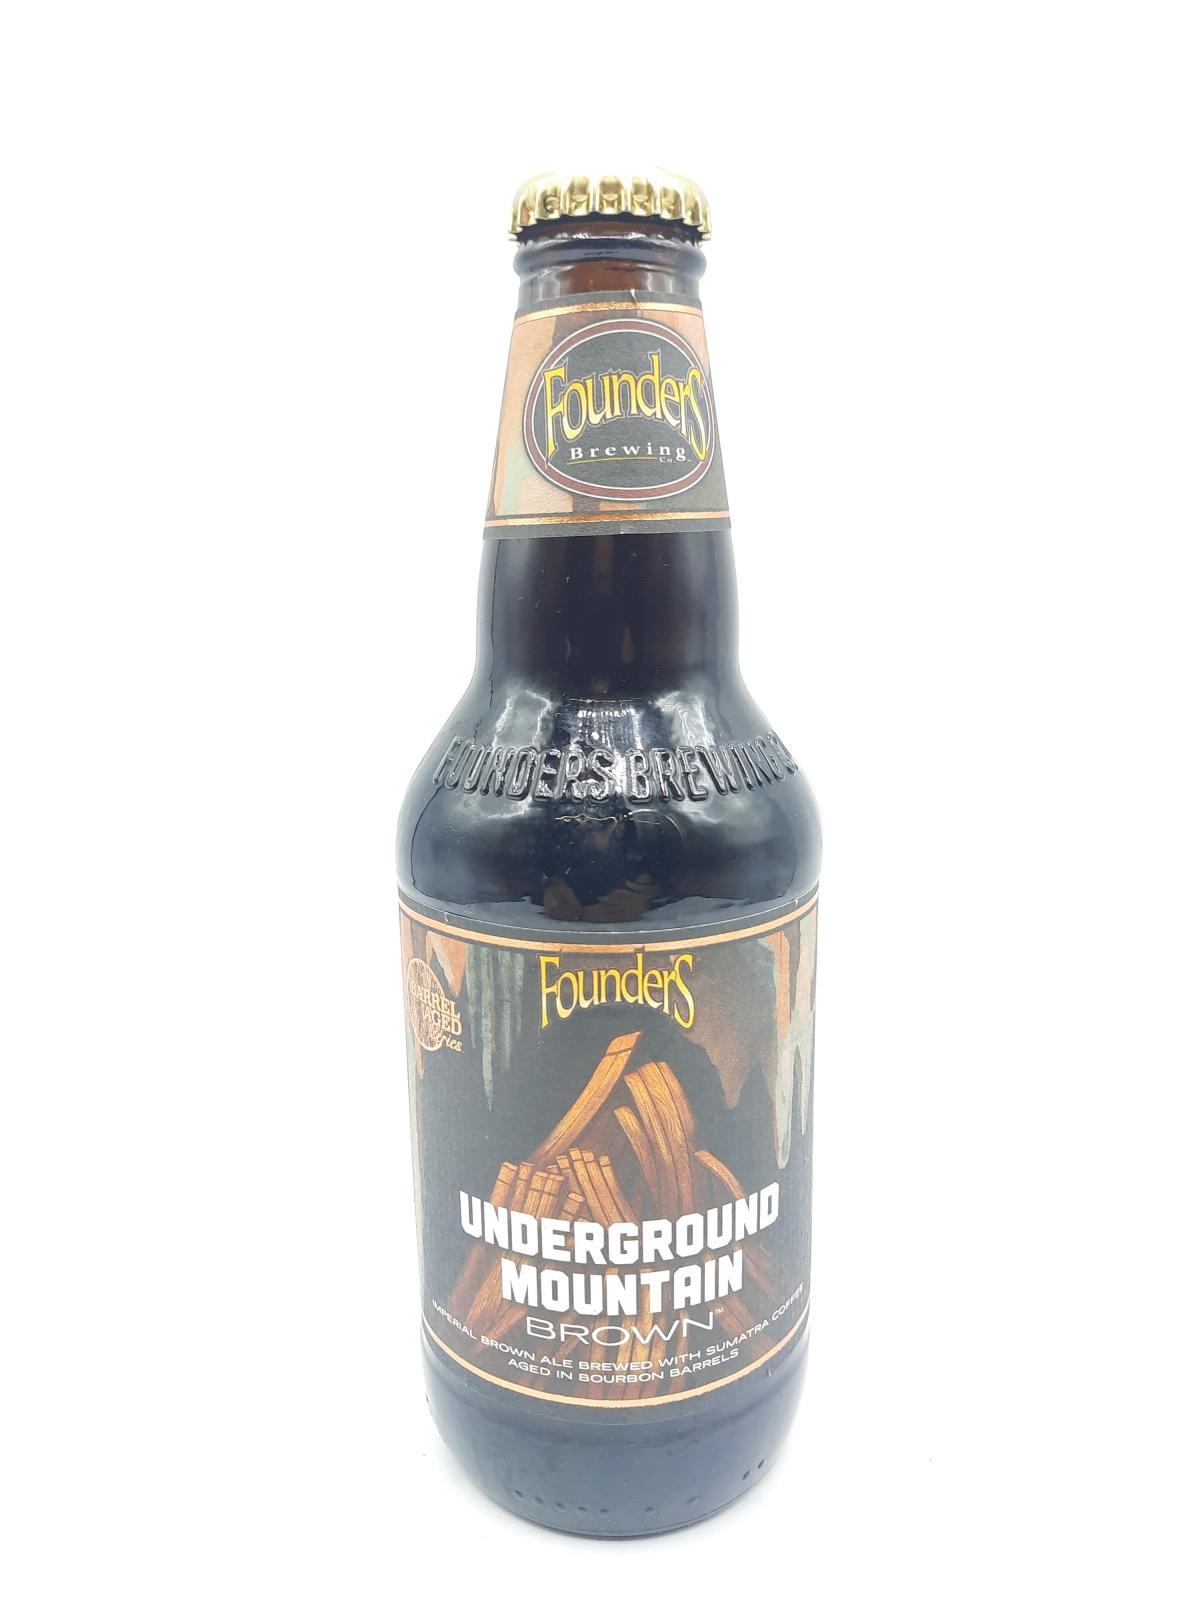 Image Underground Mountain